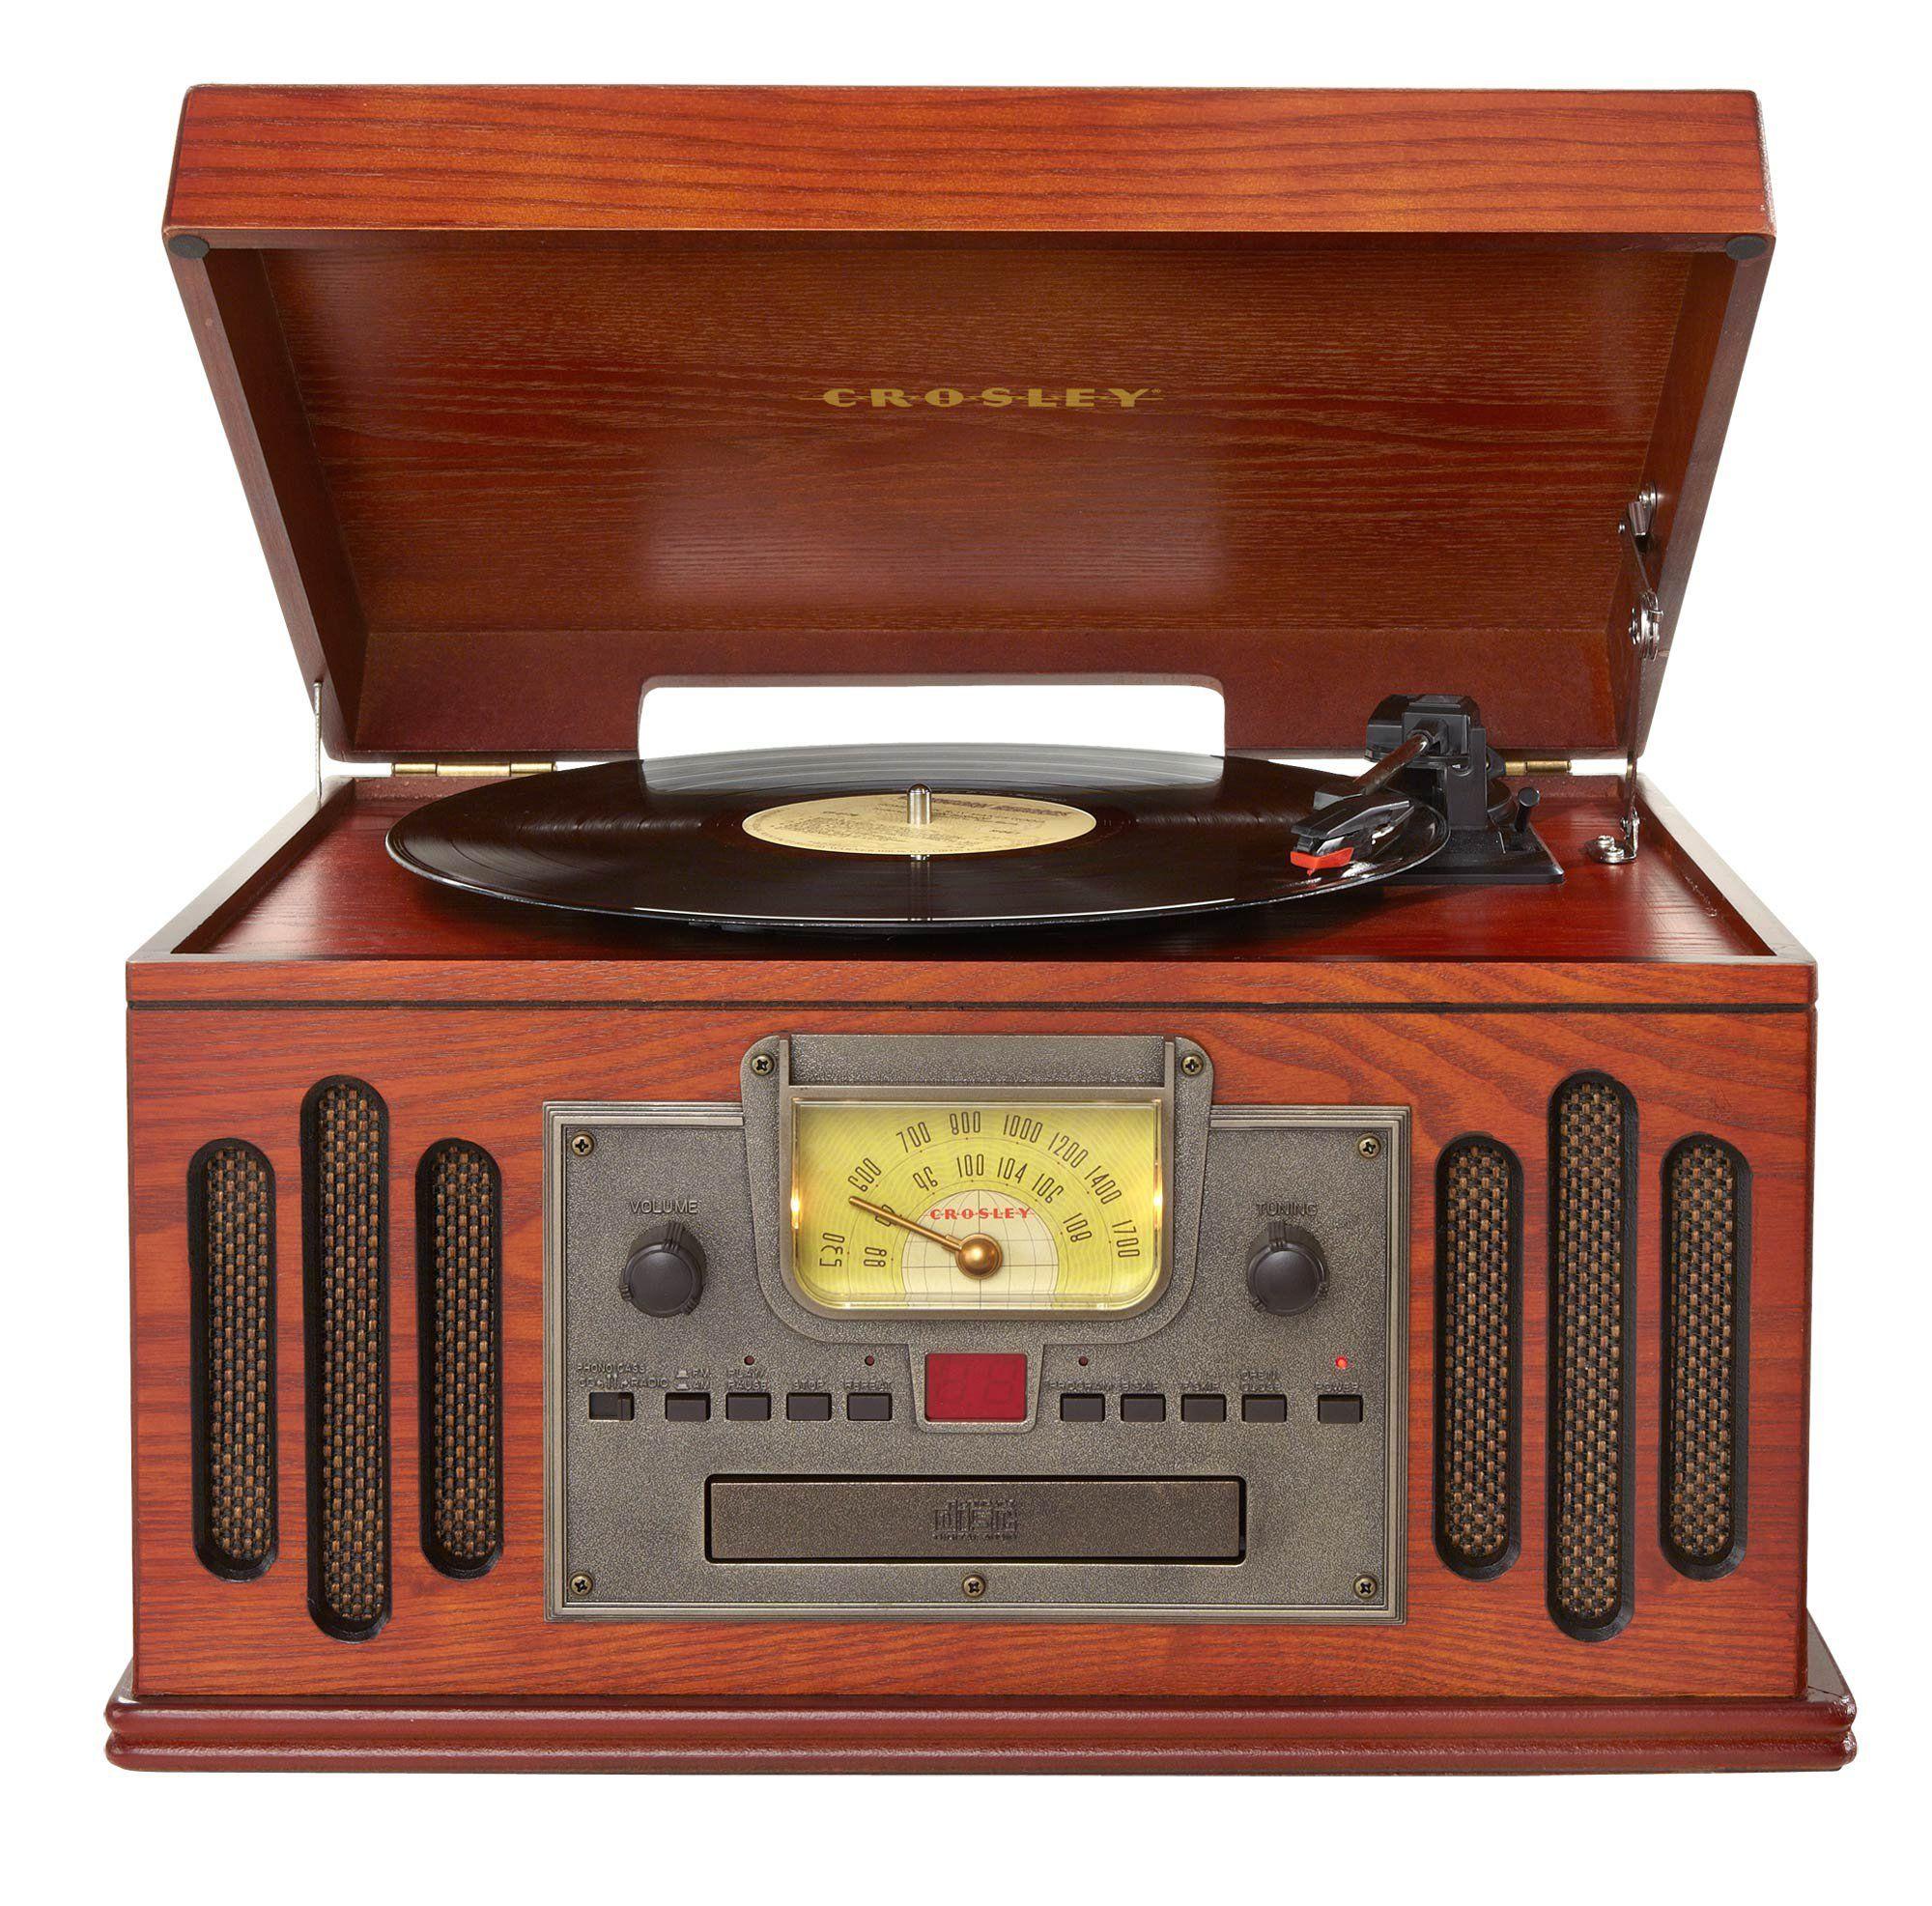 amazon com crosley cr704c pa musician 3 speed turntable with cd